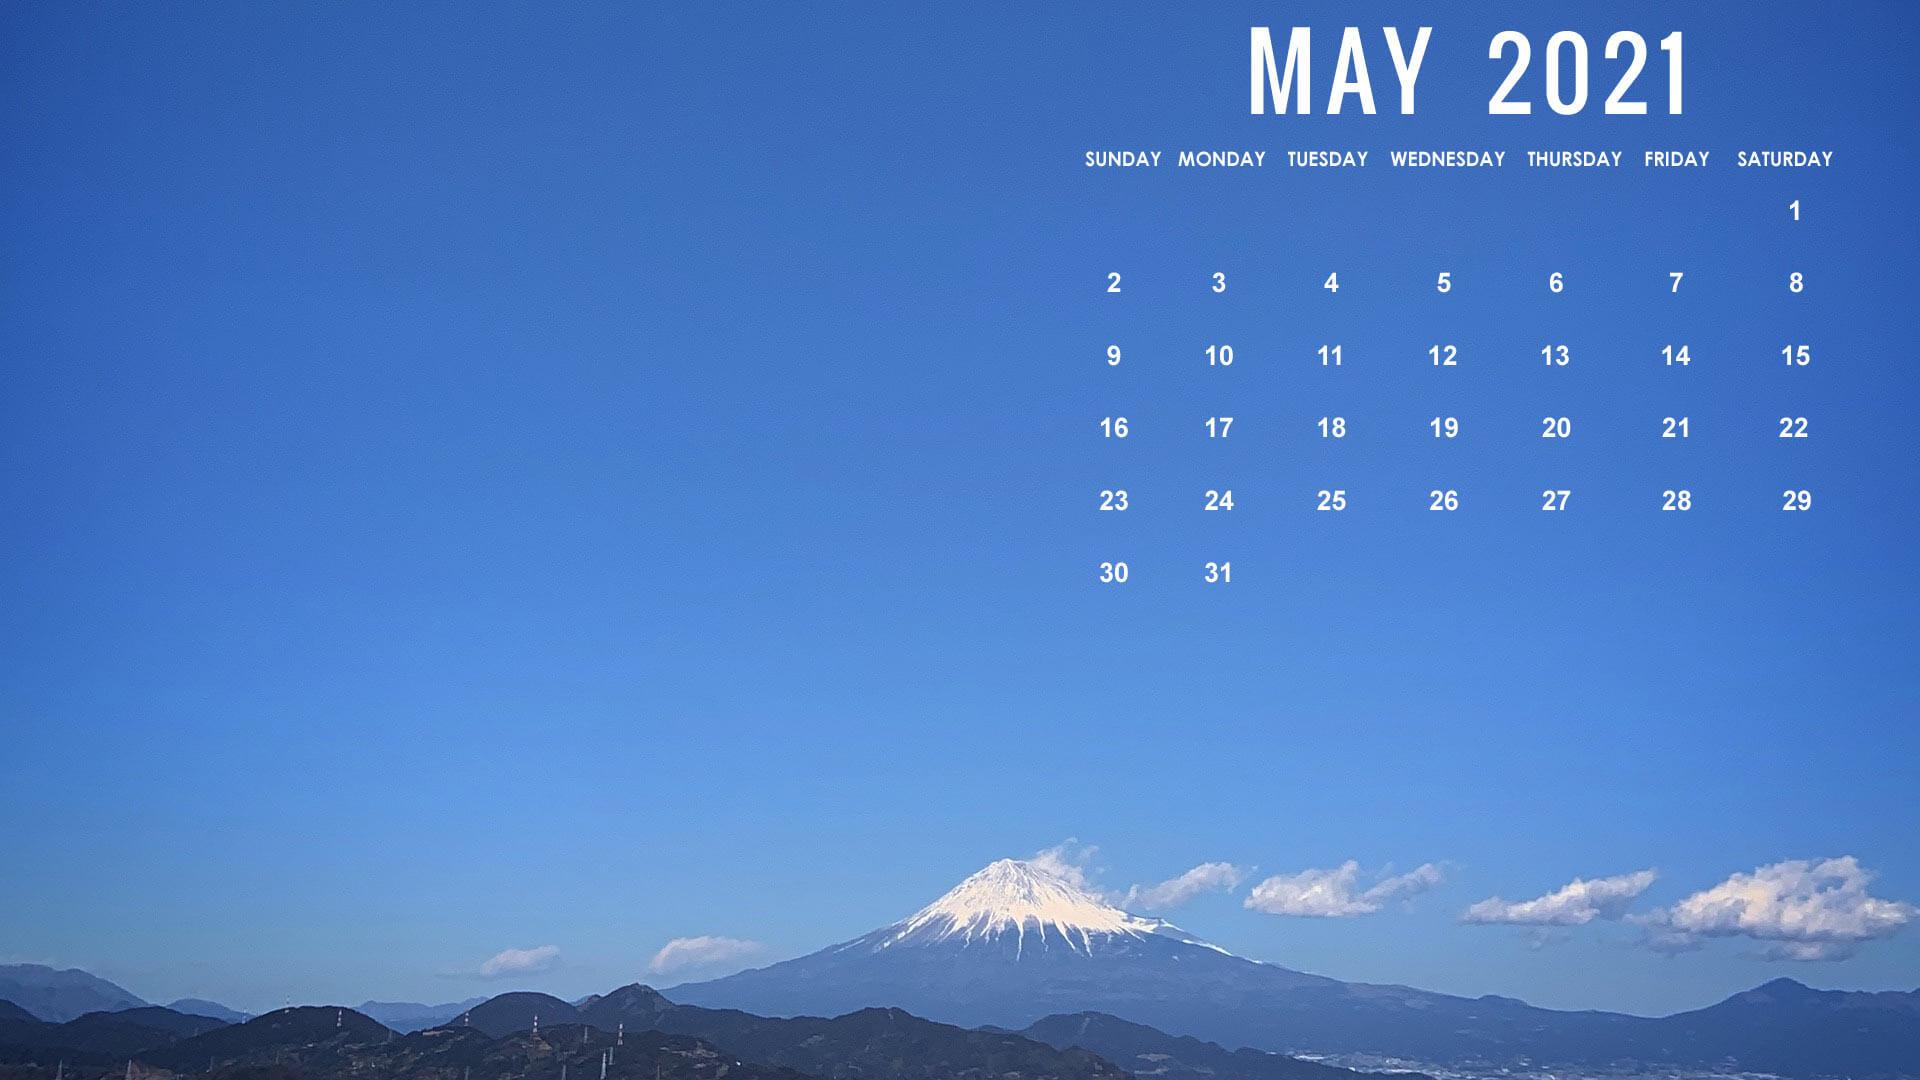 May 2021 Desktop Screensaver Calendar